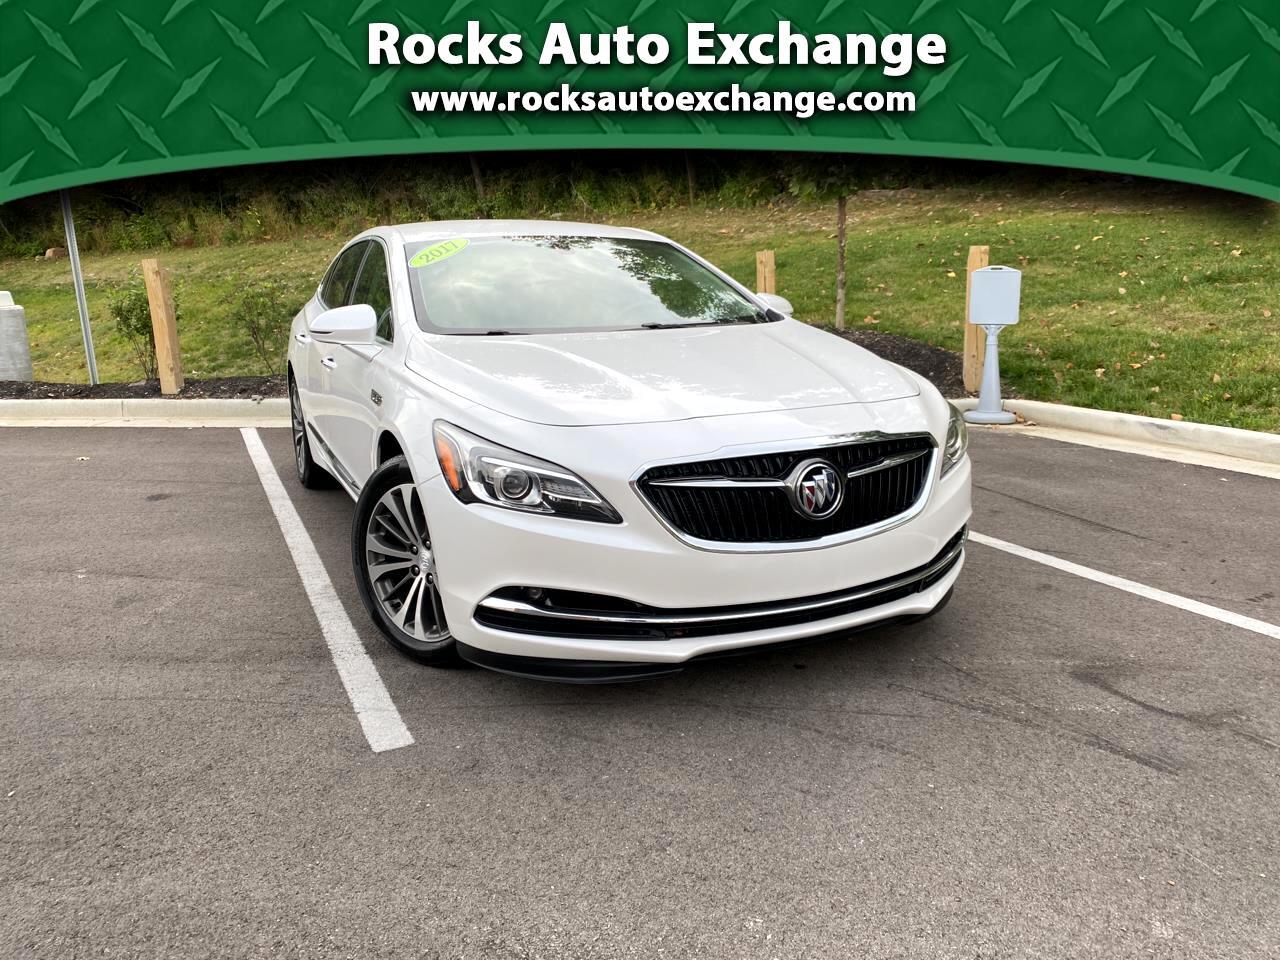 Buick LaCrosse 4dr Sdn Preferred FWD 2017